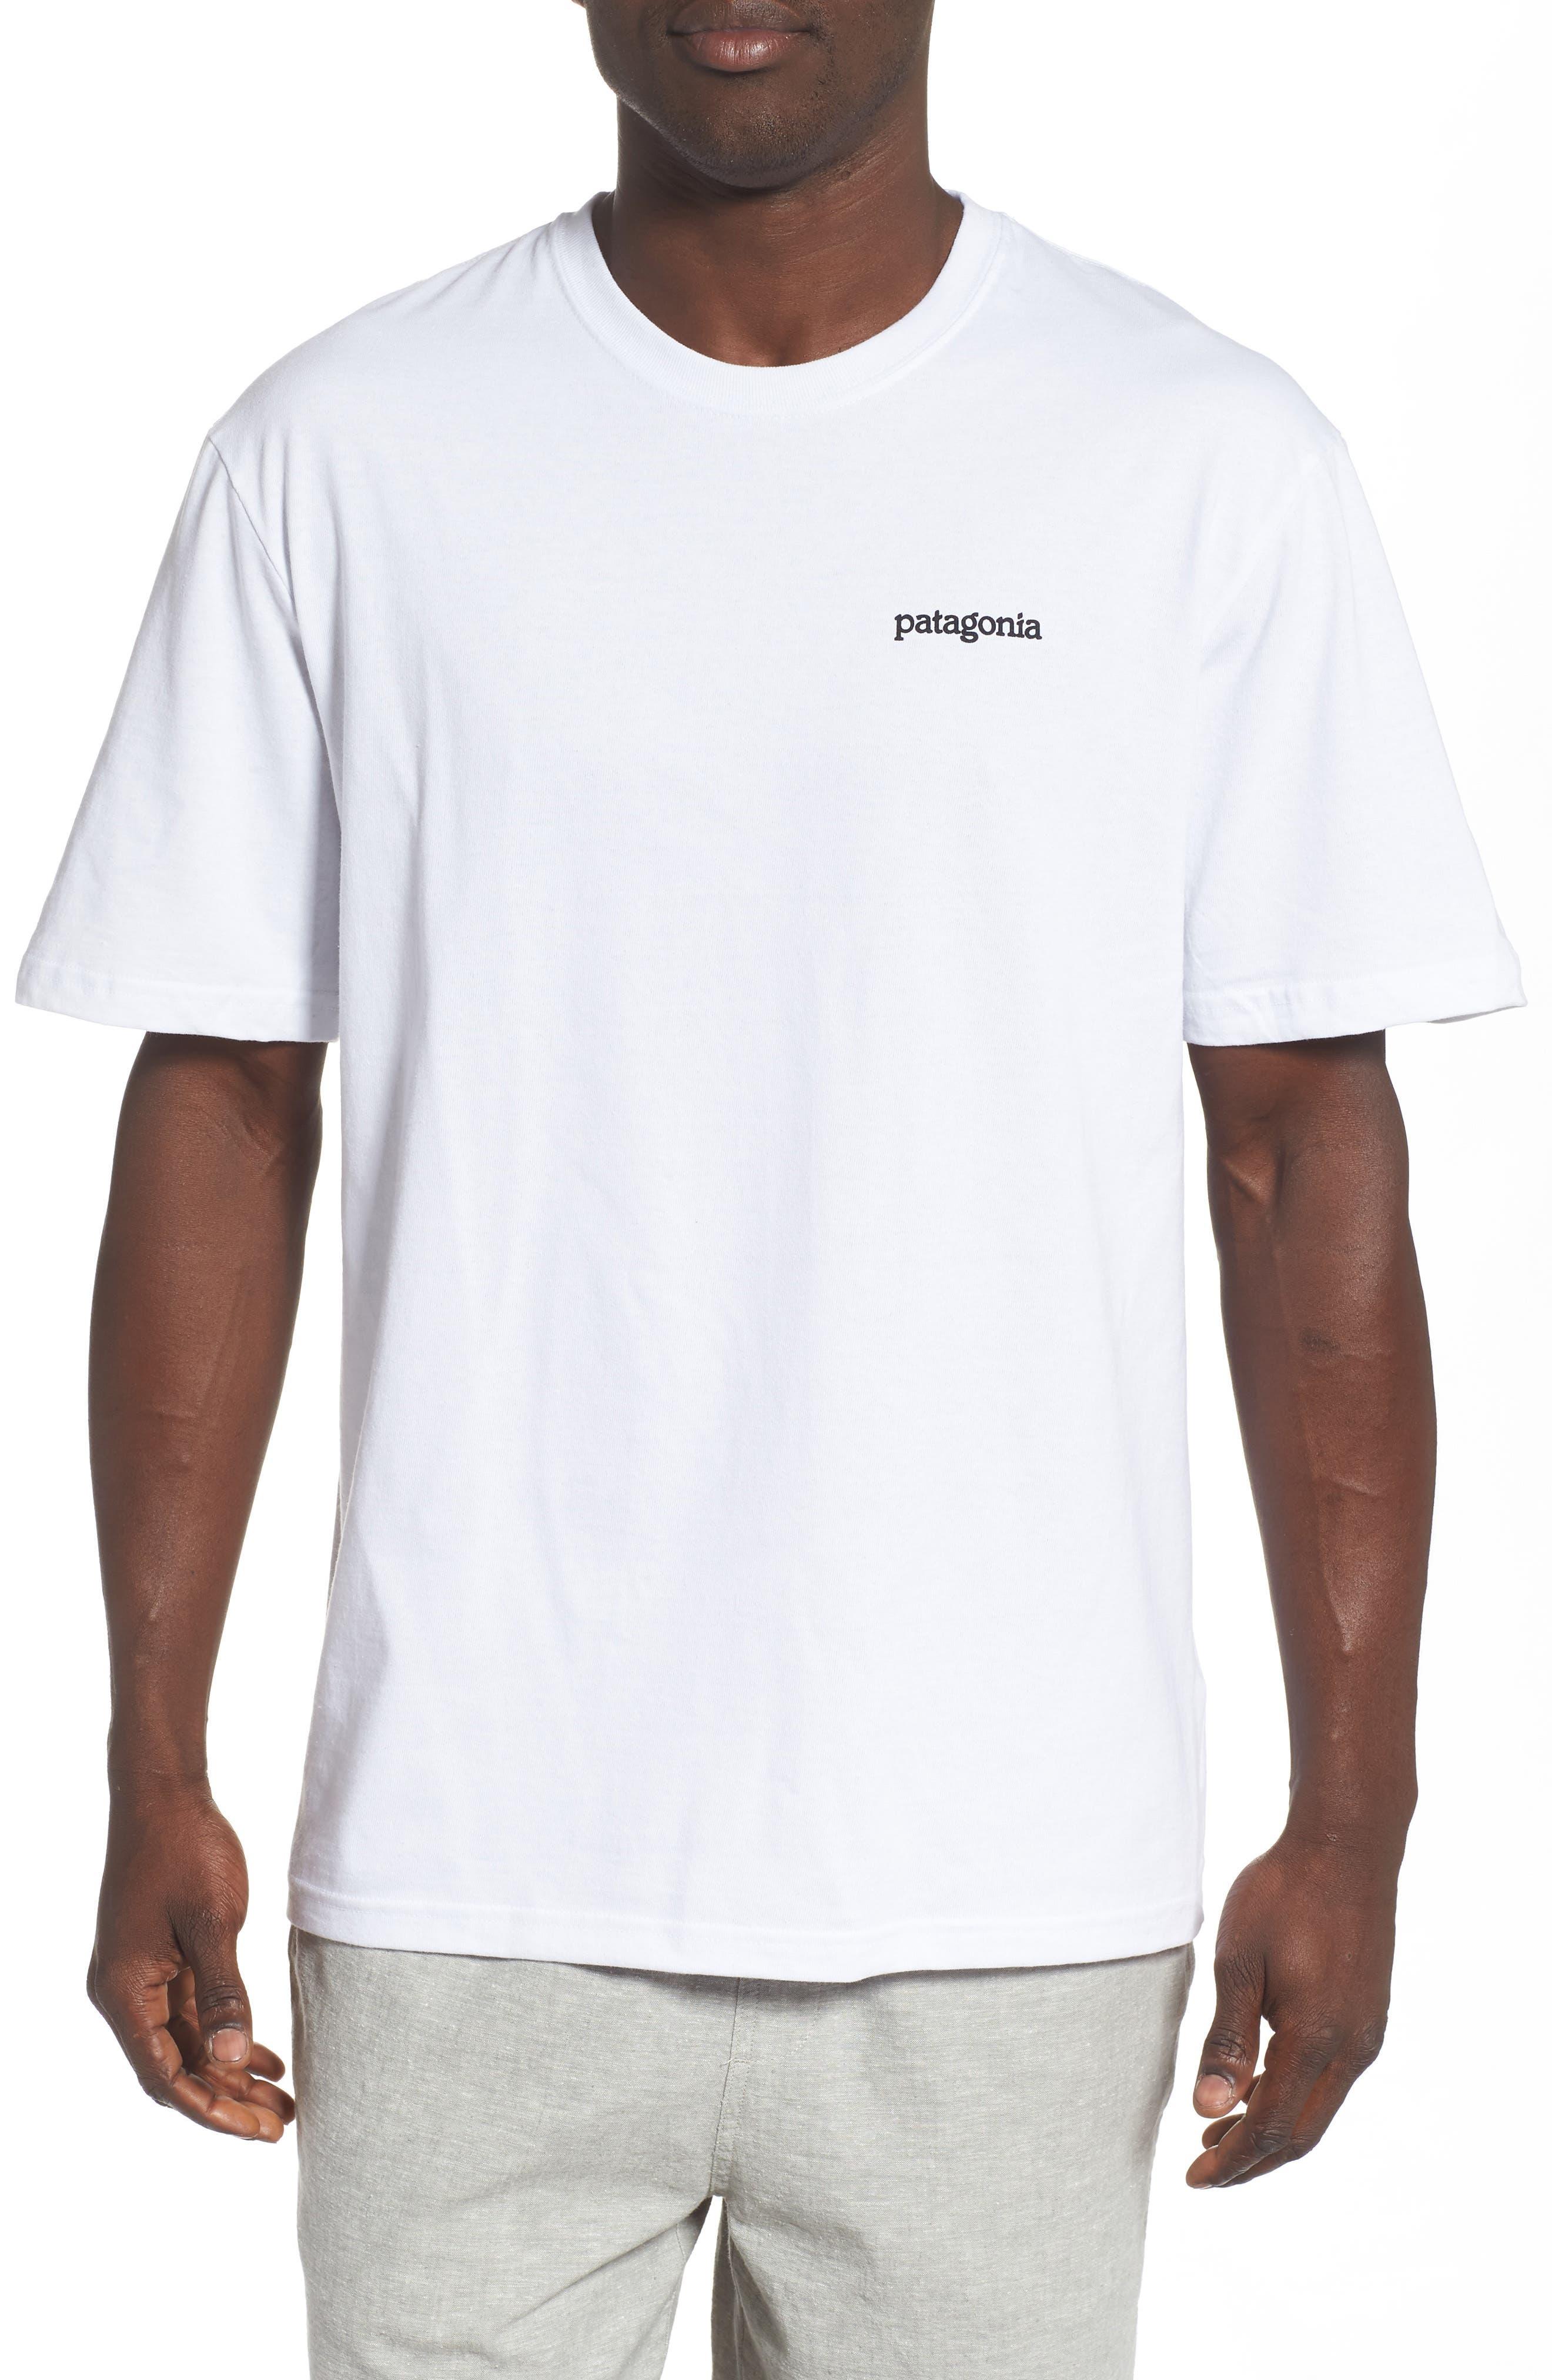 Patagonia Fitz Roy Horizons Graphic Responsibili-Tee T-Shirt, White